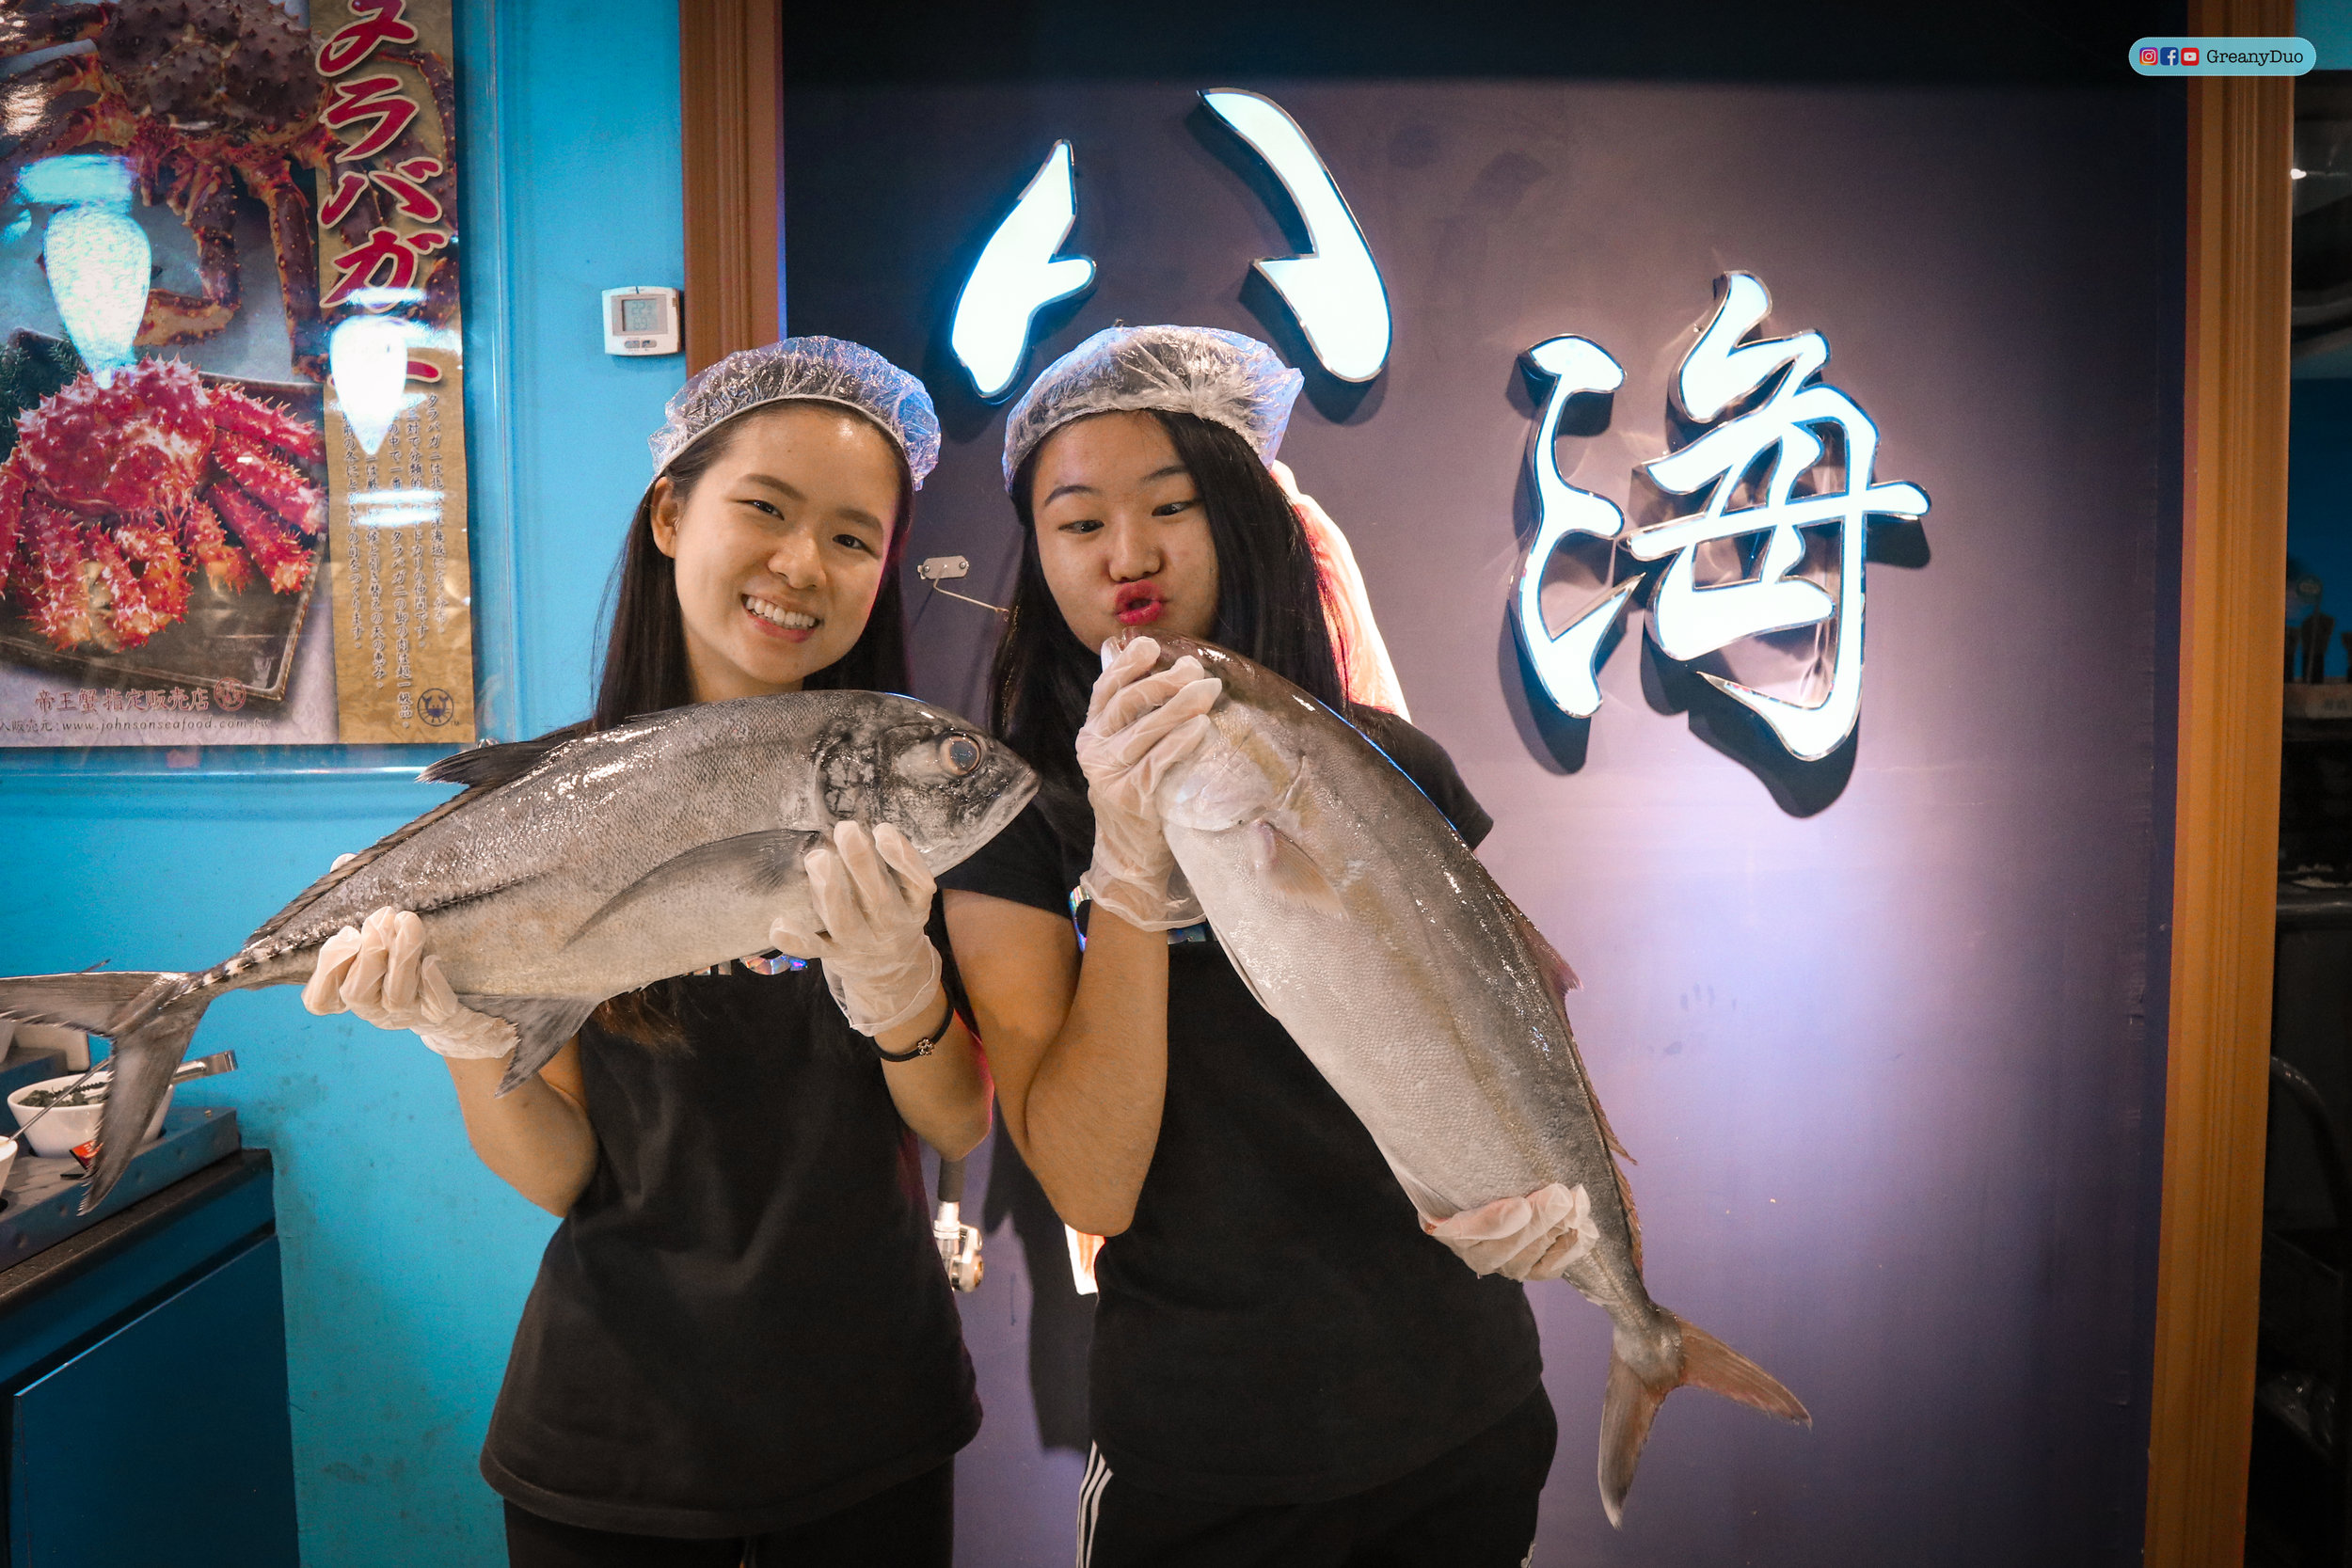 jenny & tina posing with fresh fishes at บุฟเฟ่ต์ชาบูไต้หวันที่ Hakkai Shabu Shabu ซีเหมินติง